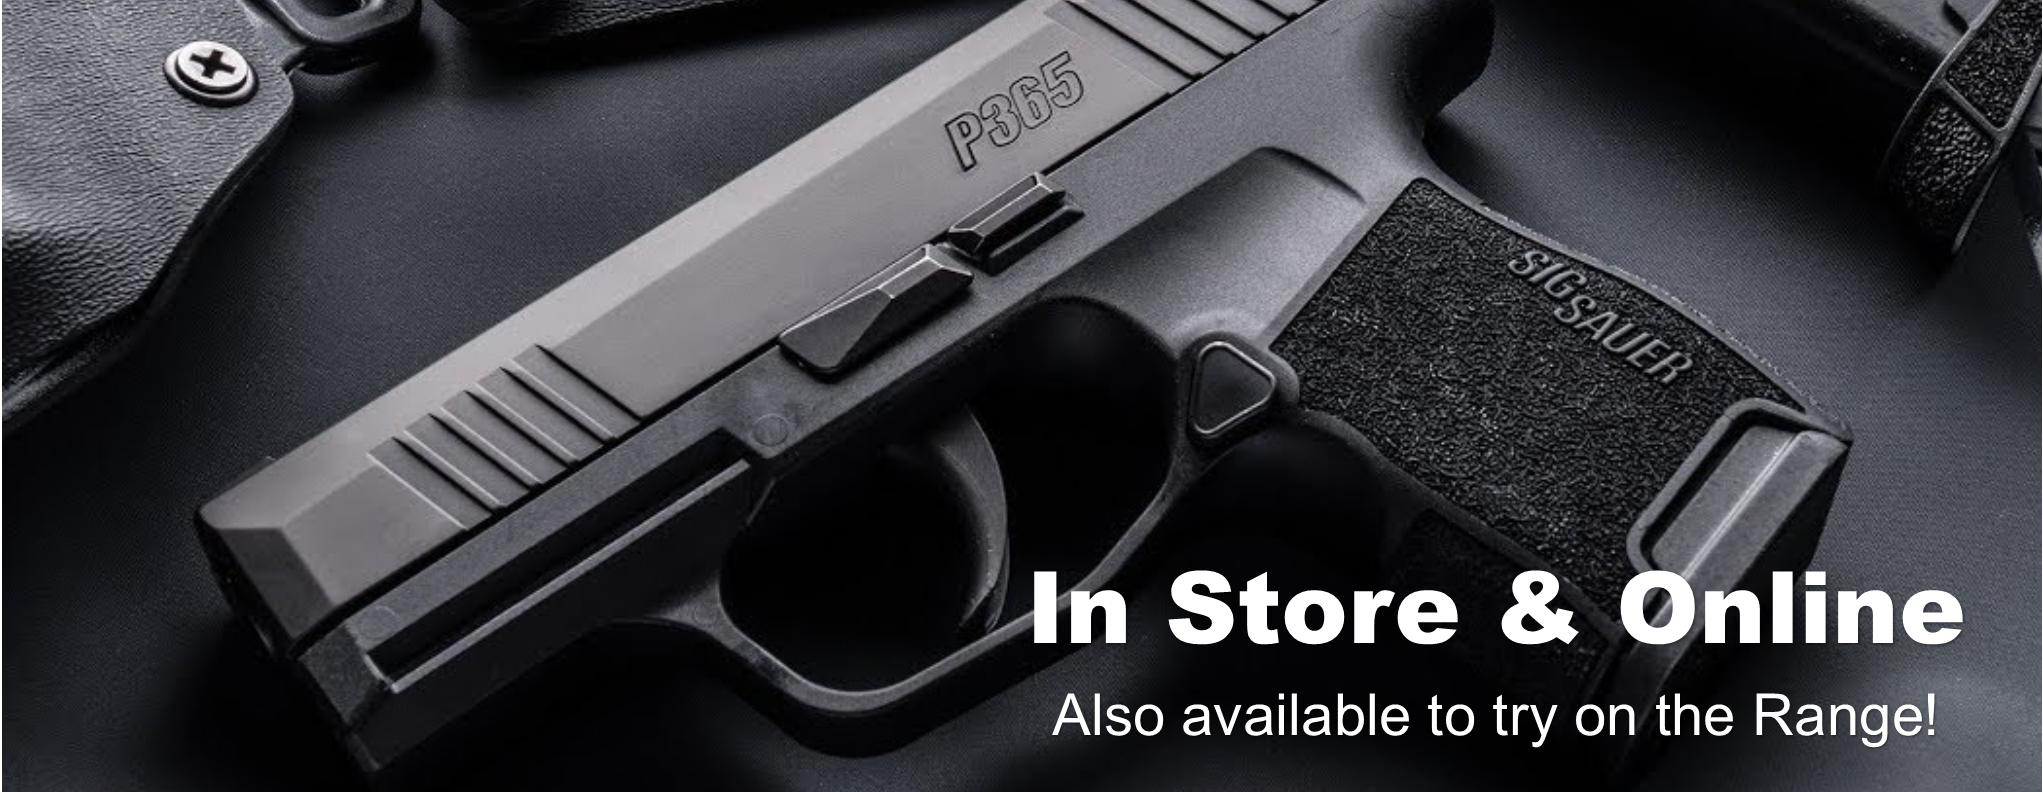 /products/handguns-sig-sauer-365-9-bxr3-798681572762-3031